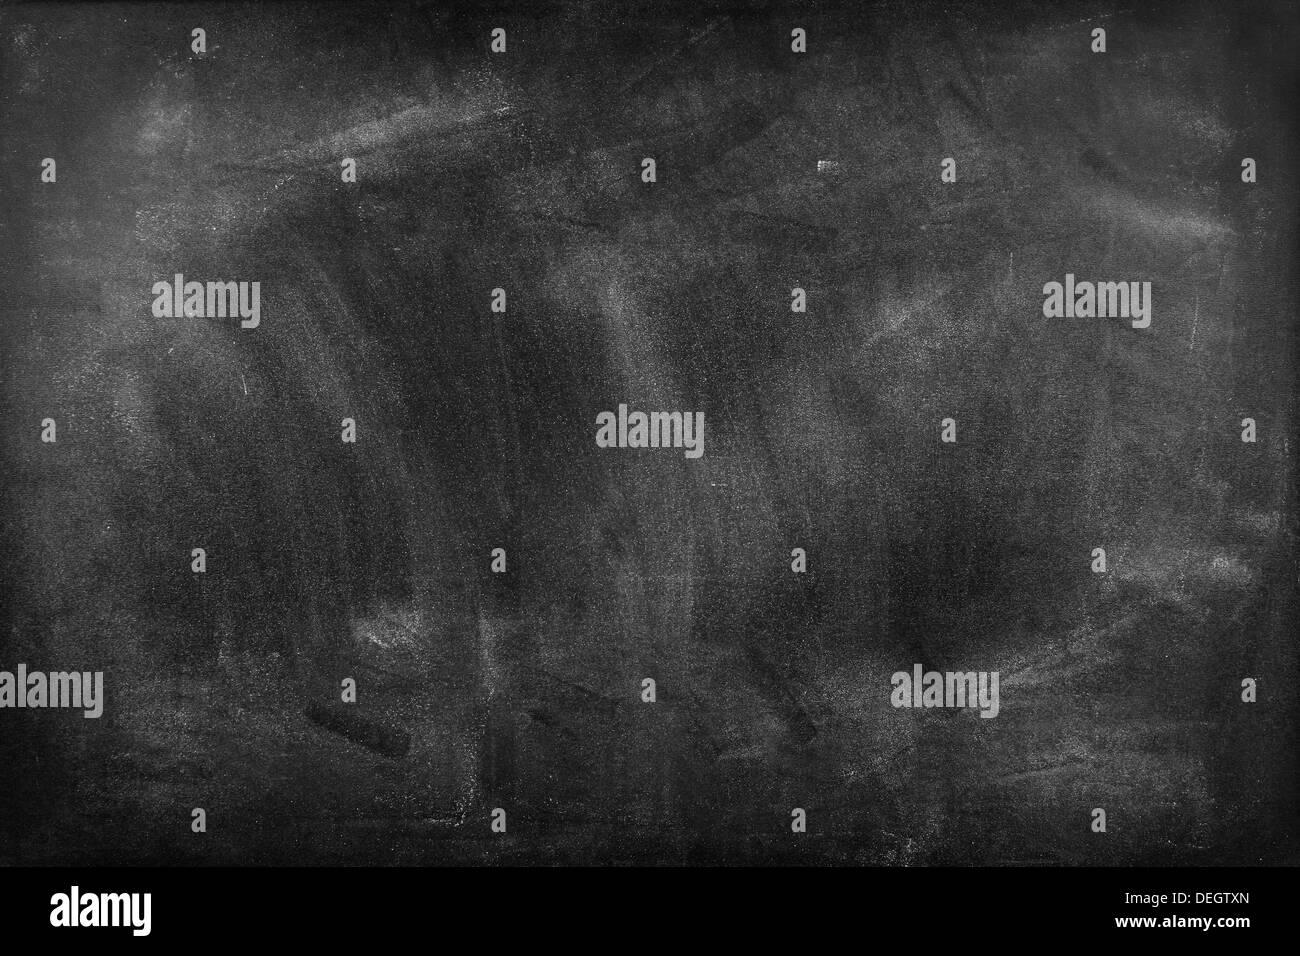 Kreide auf Tafel ausradiert Stockbild